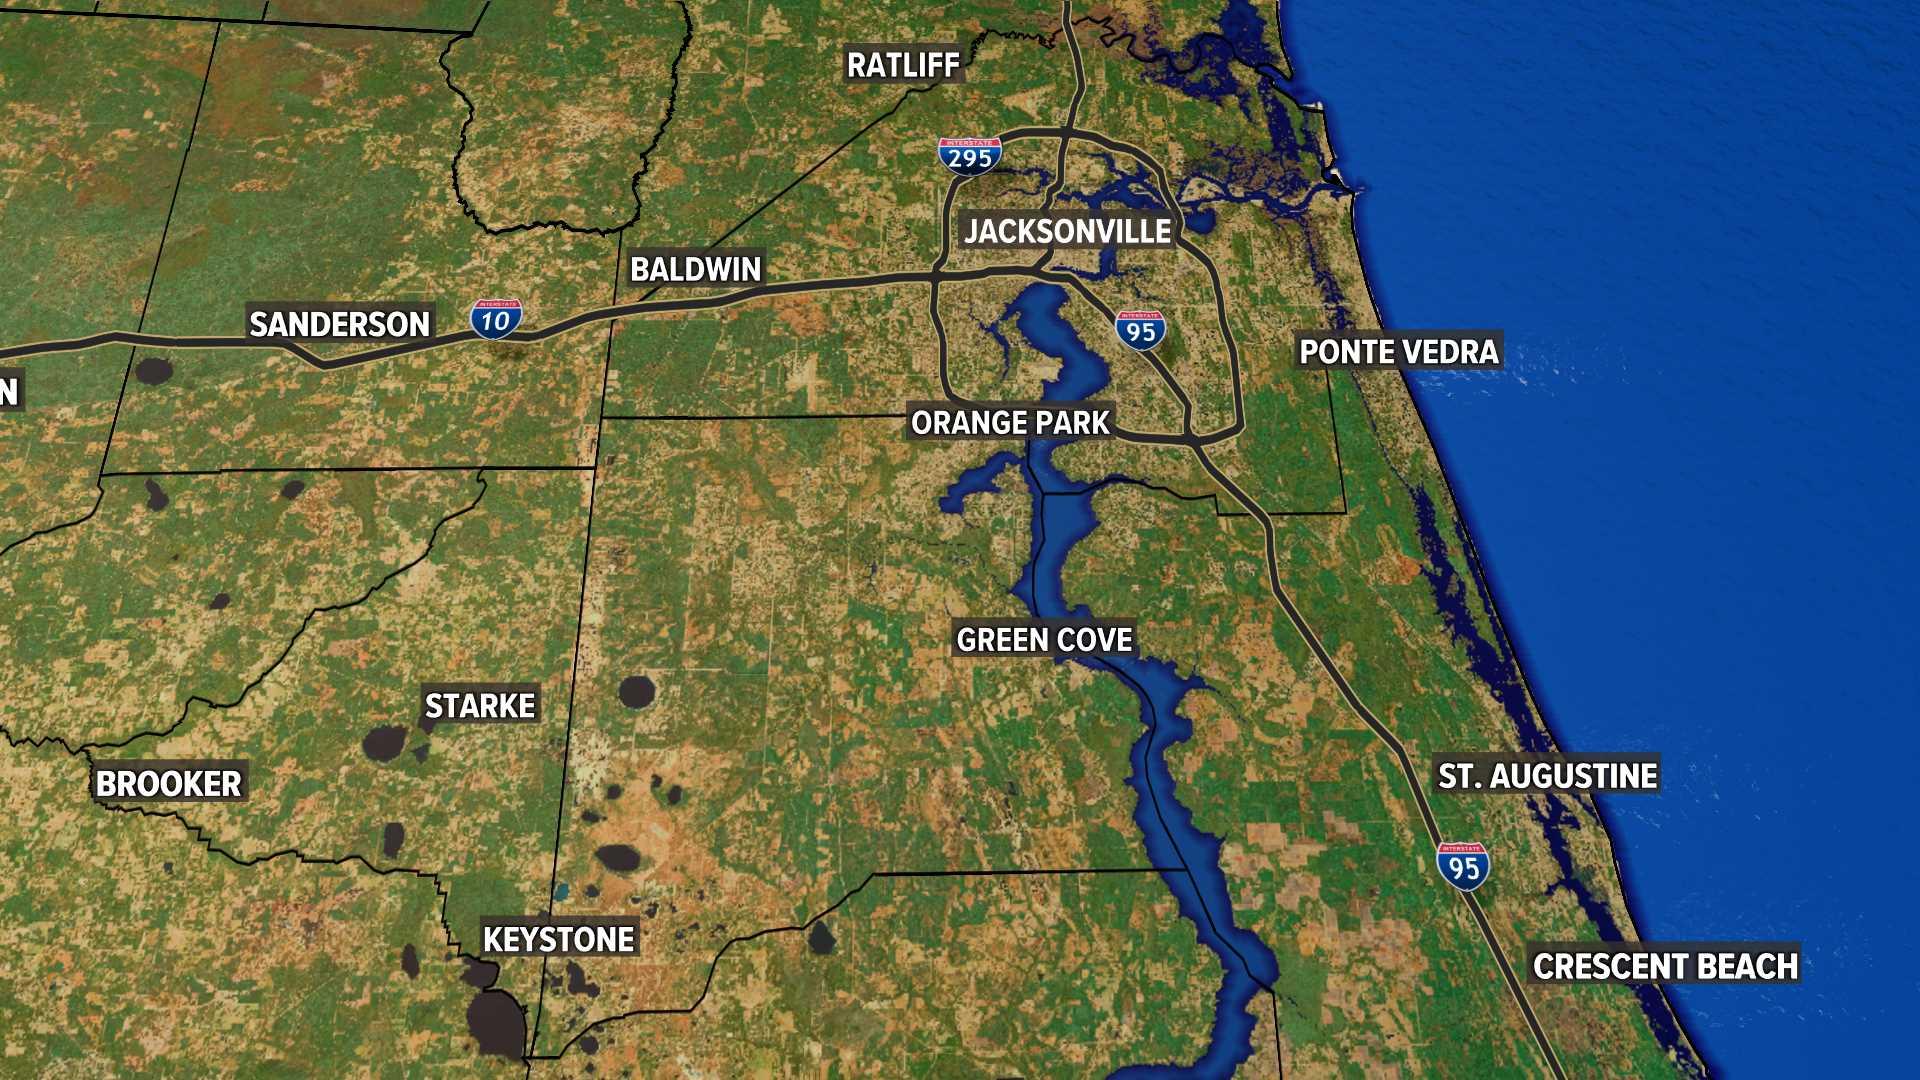 Jacksonville Radar